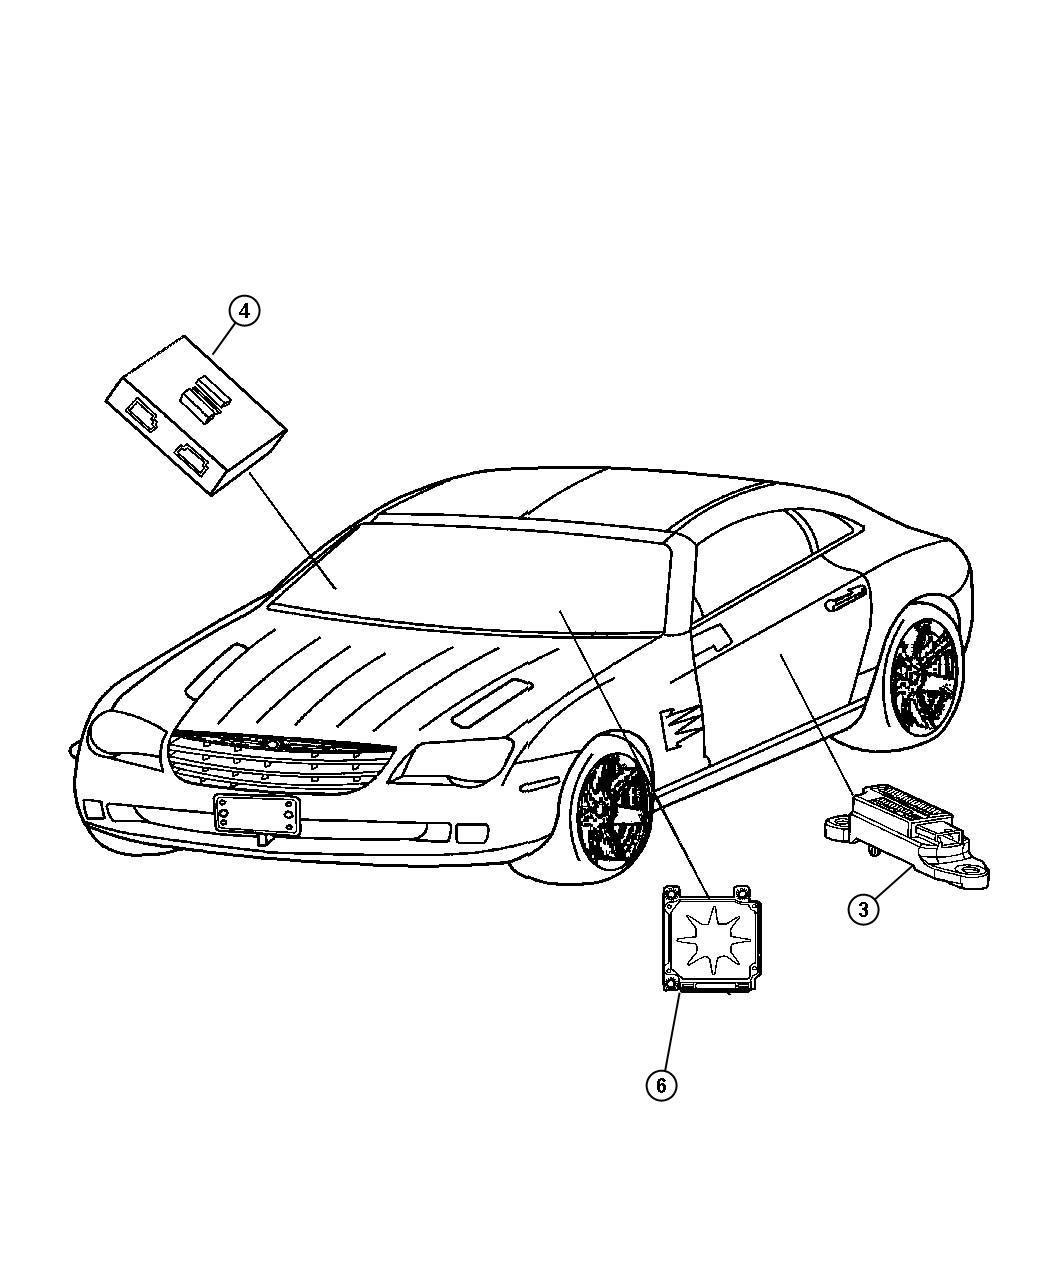 Chrysler Crossfire Sensor Air Bag Build To Export